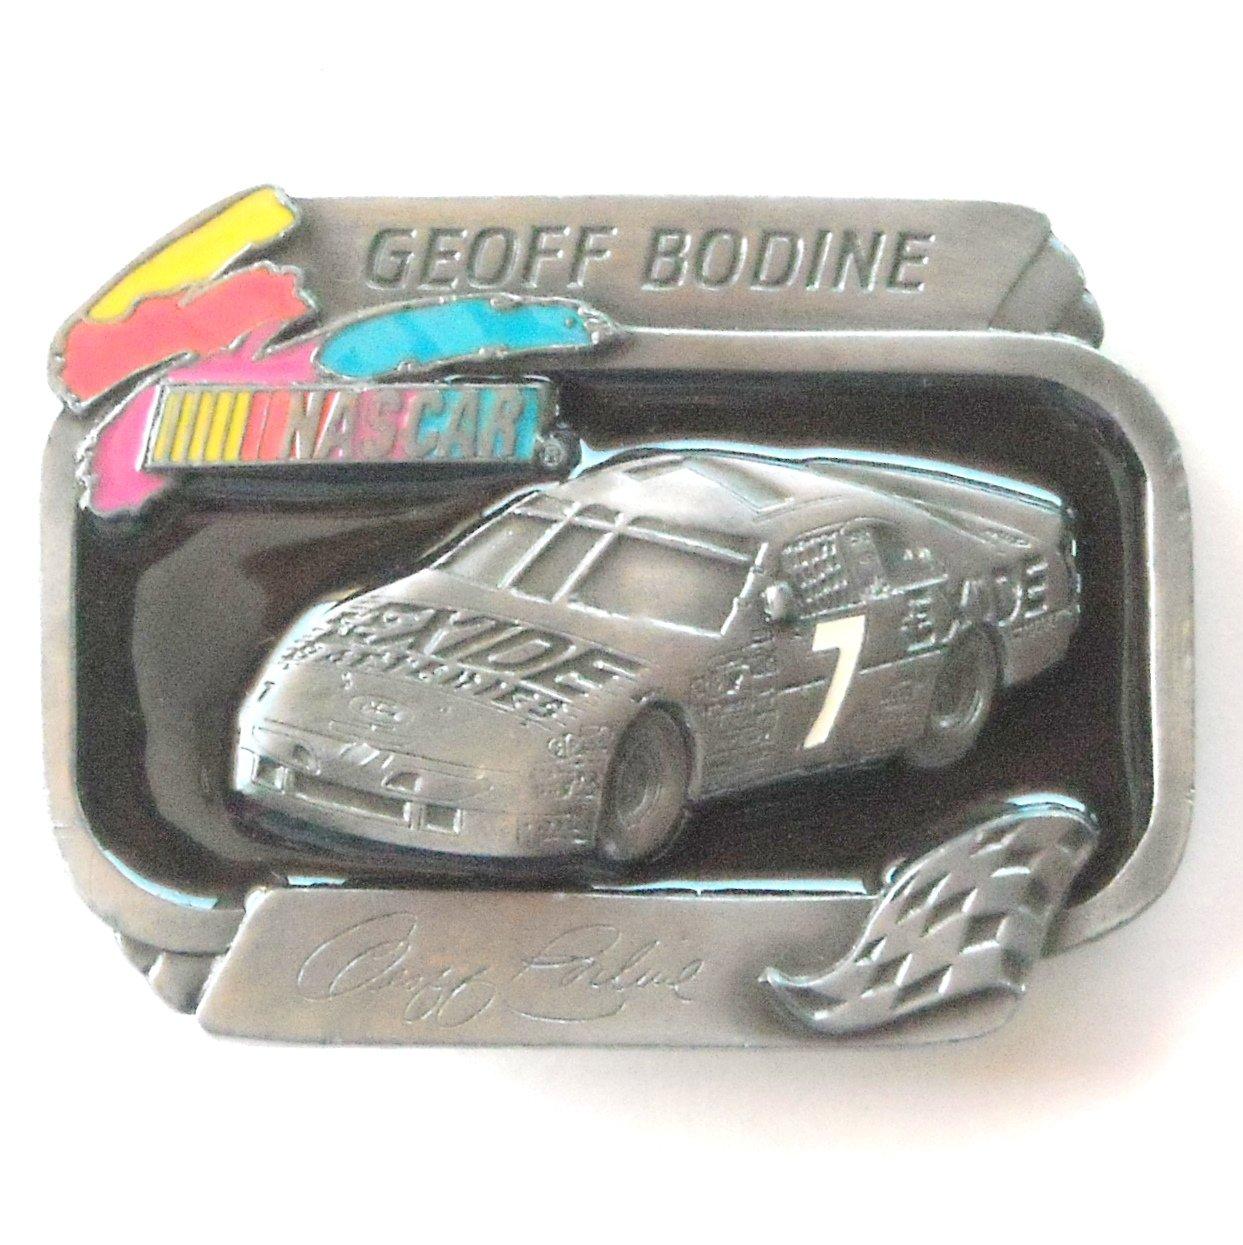 Geoff Bodine American Legends Nascar Exide 7 Limited Edition 498 Belt Buckle